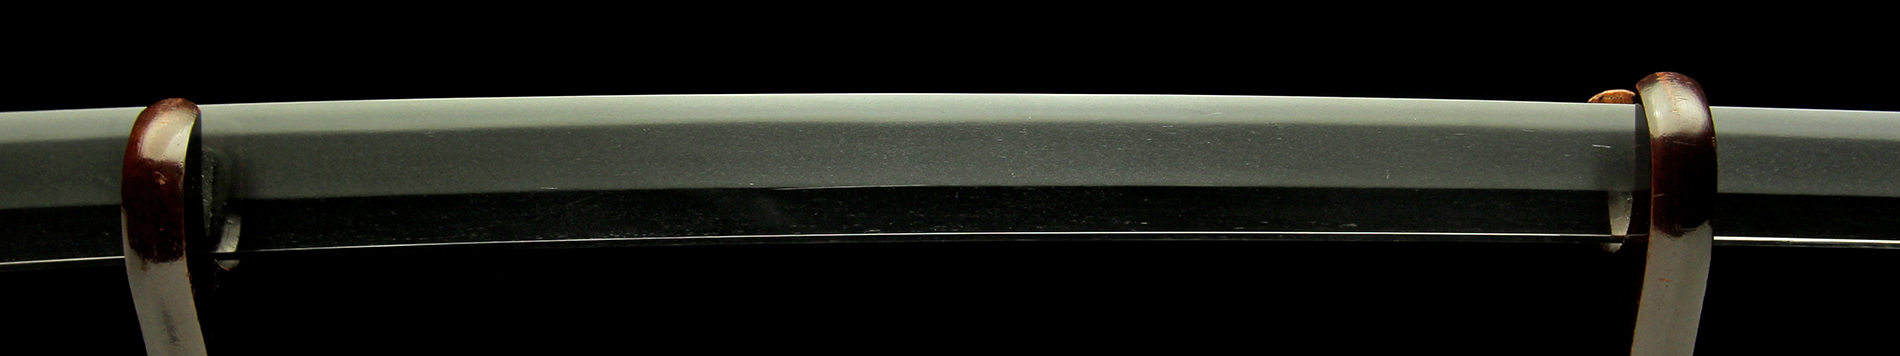 01-1114